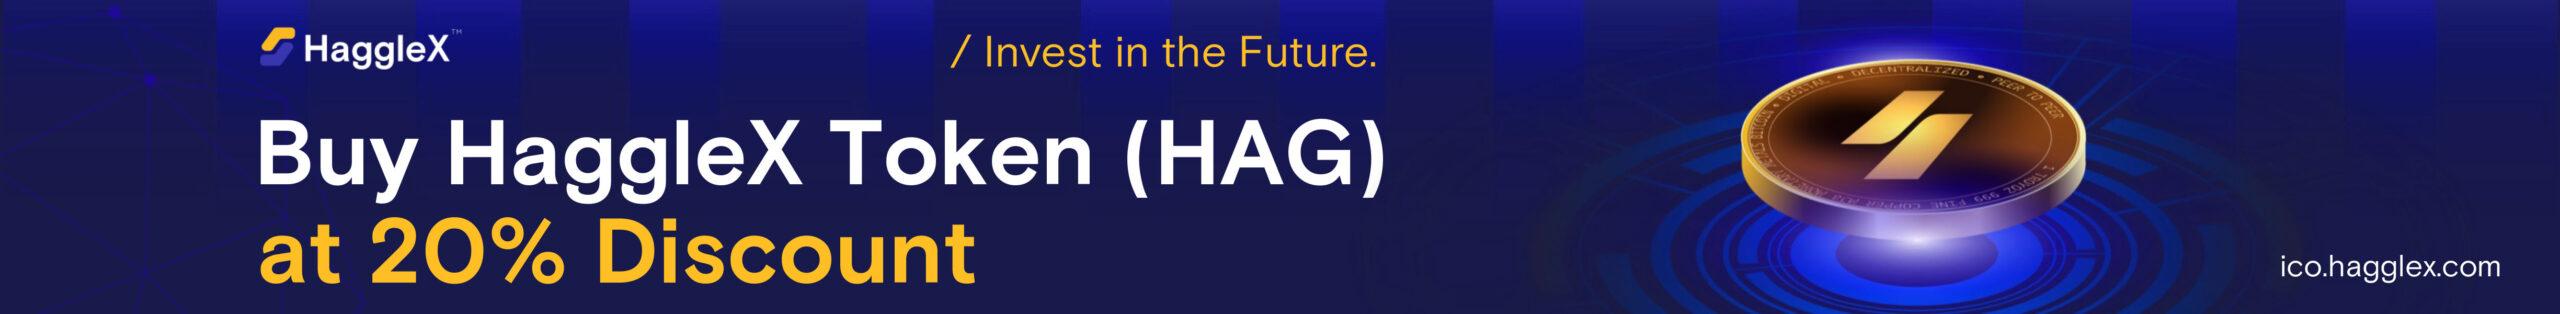 hagglex ico, bitcoin, ethereum, eos, usdt, blockchain